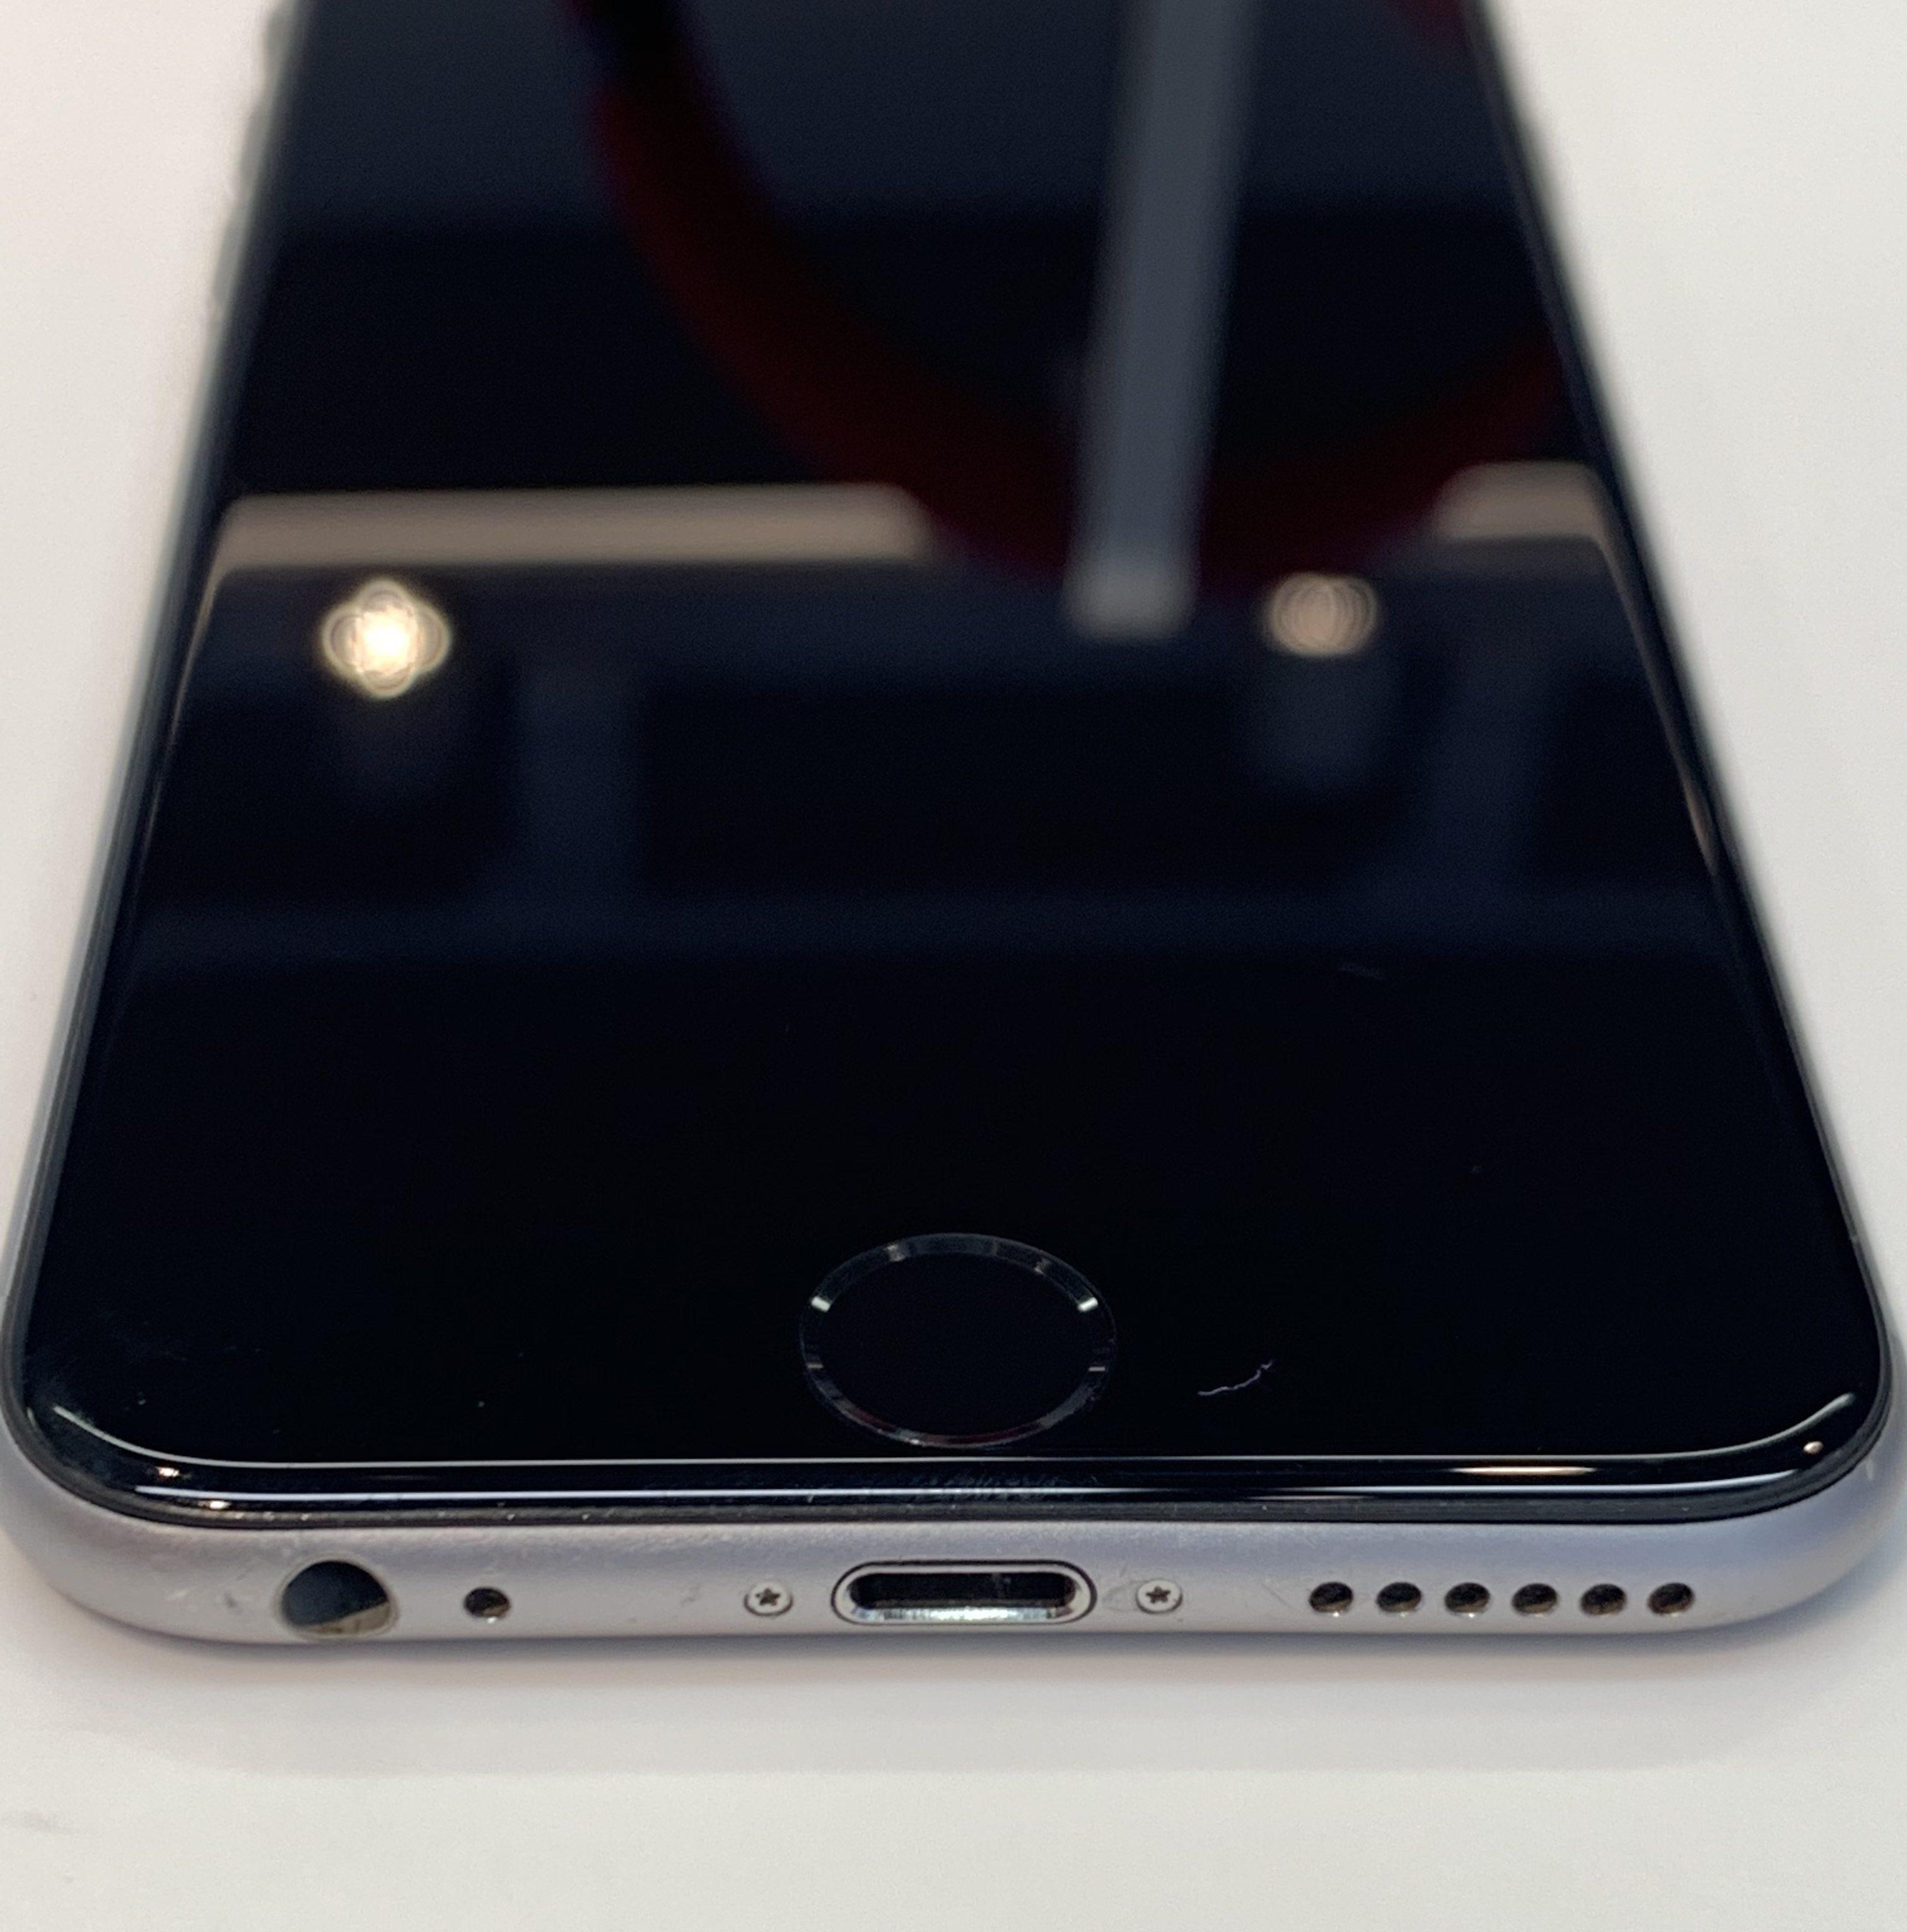 iPhone 6 32GB, 32 GB, Space Gray, obraz 2